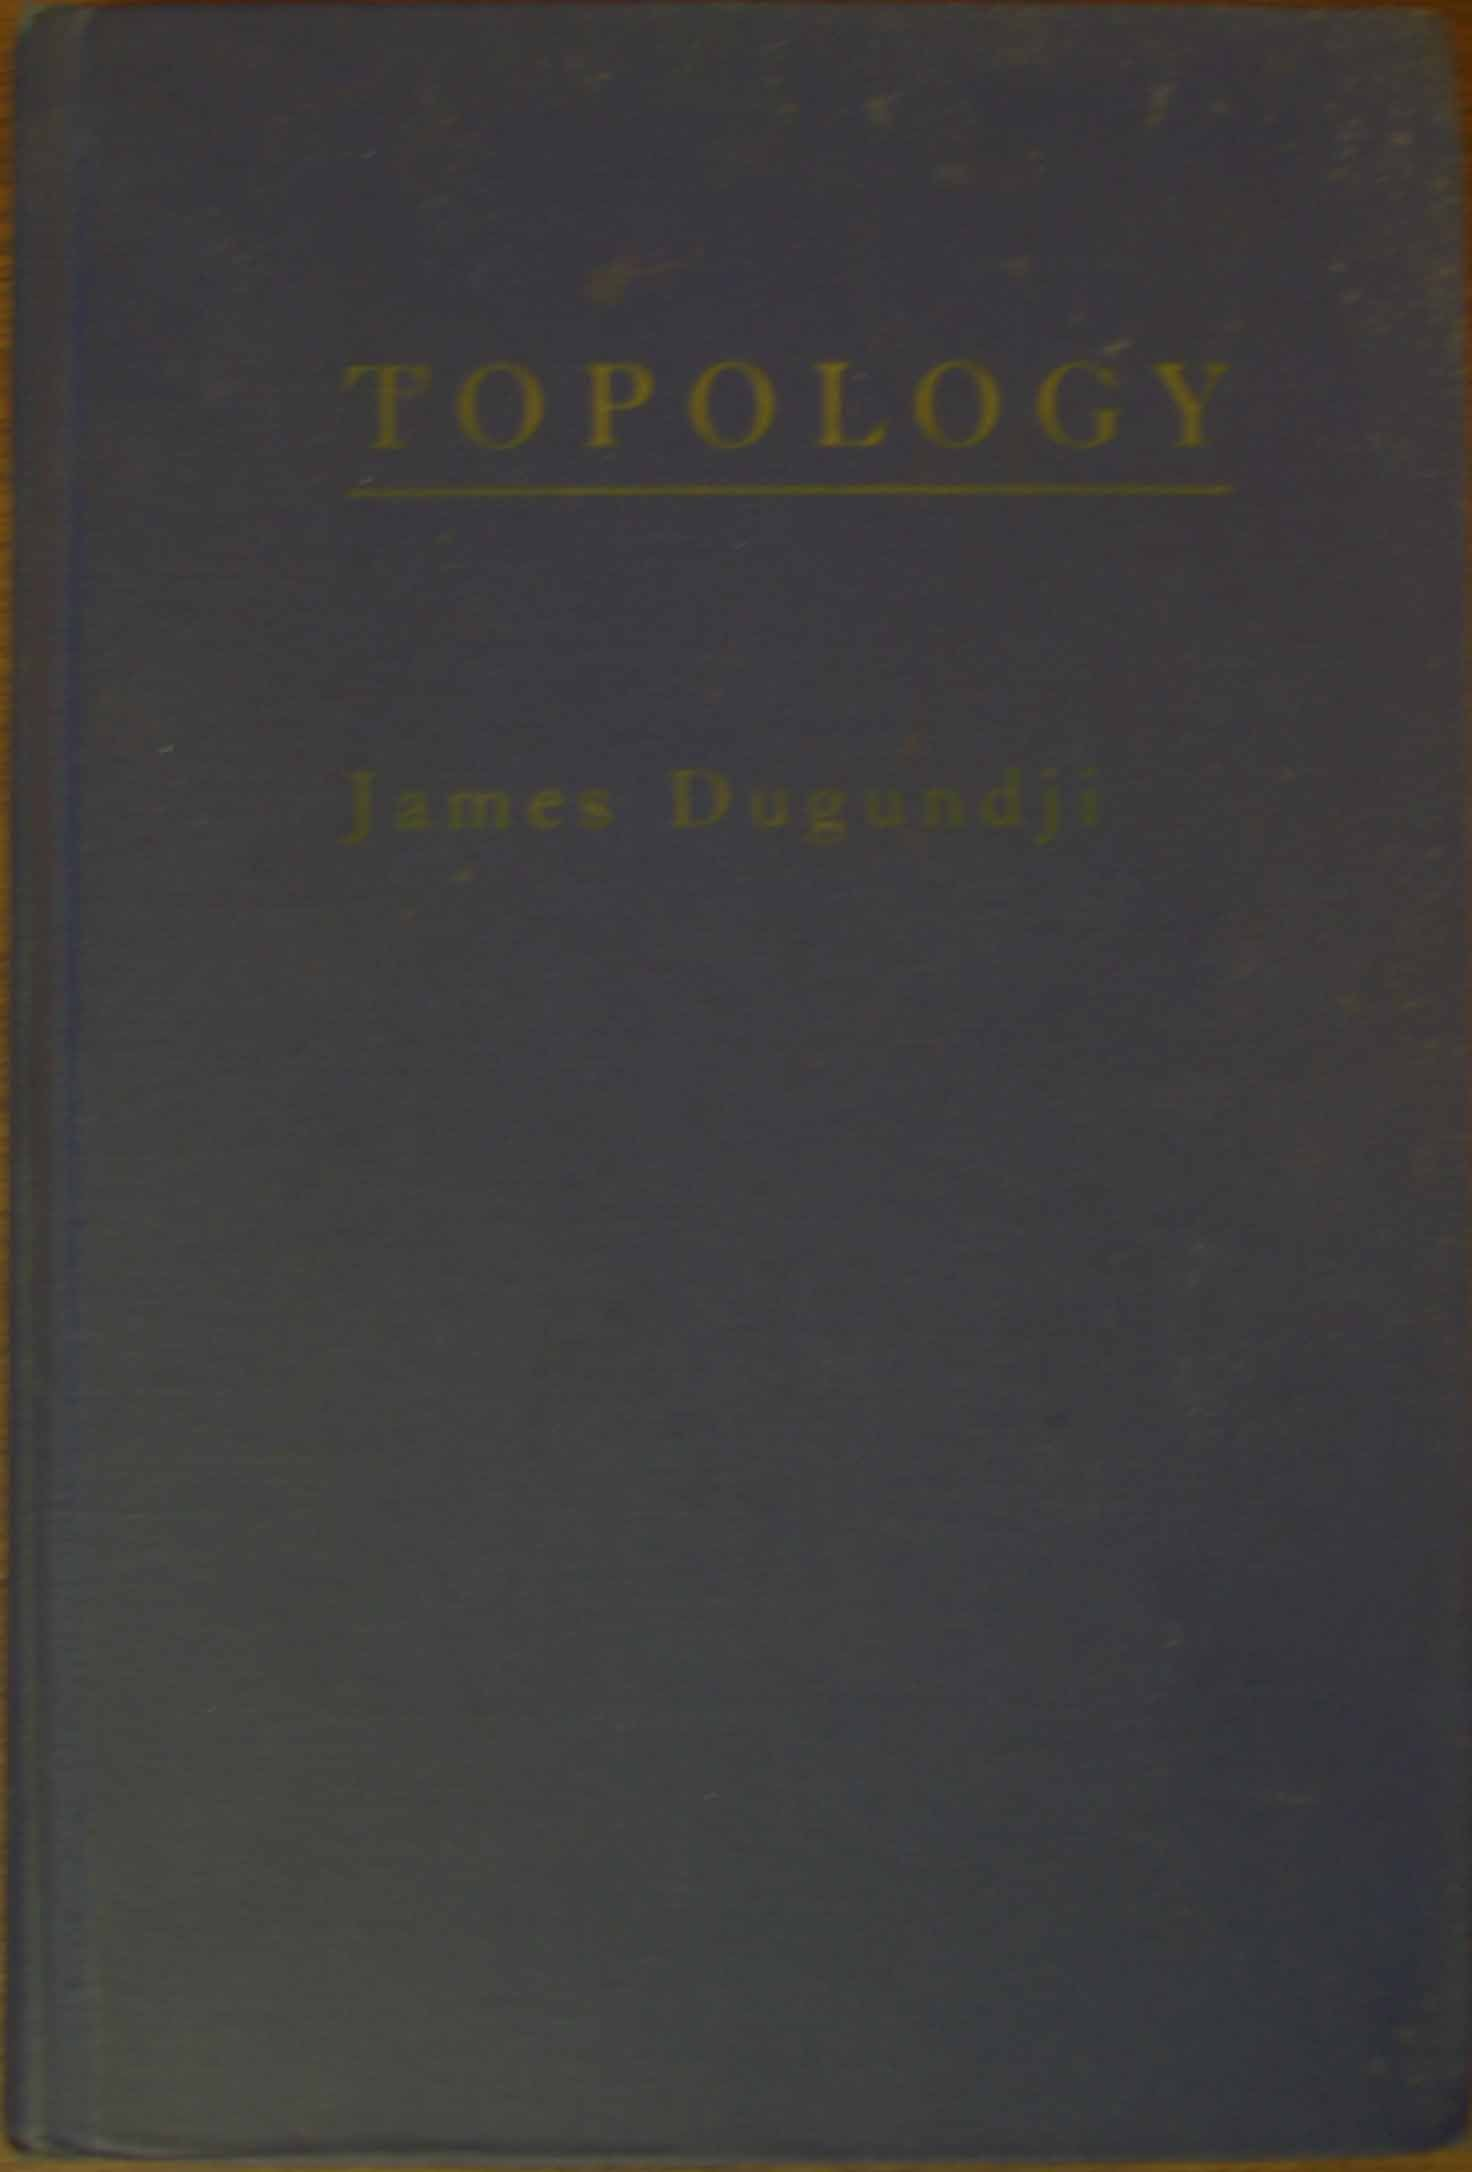 james dugundji topology